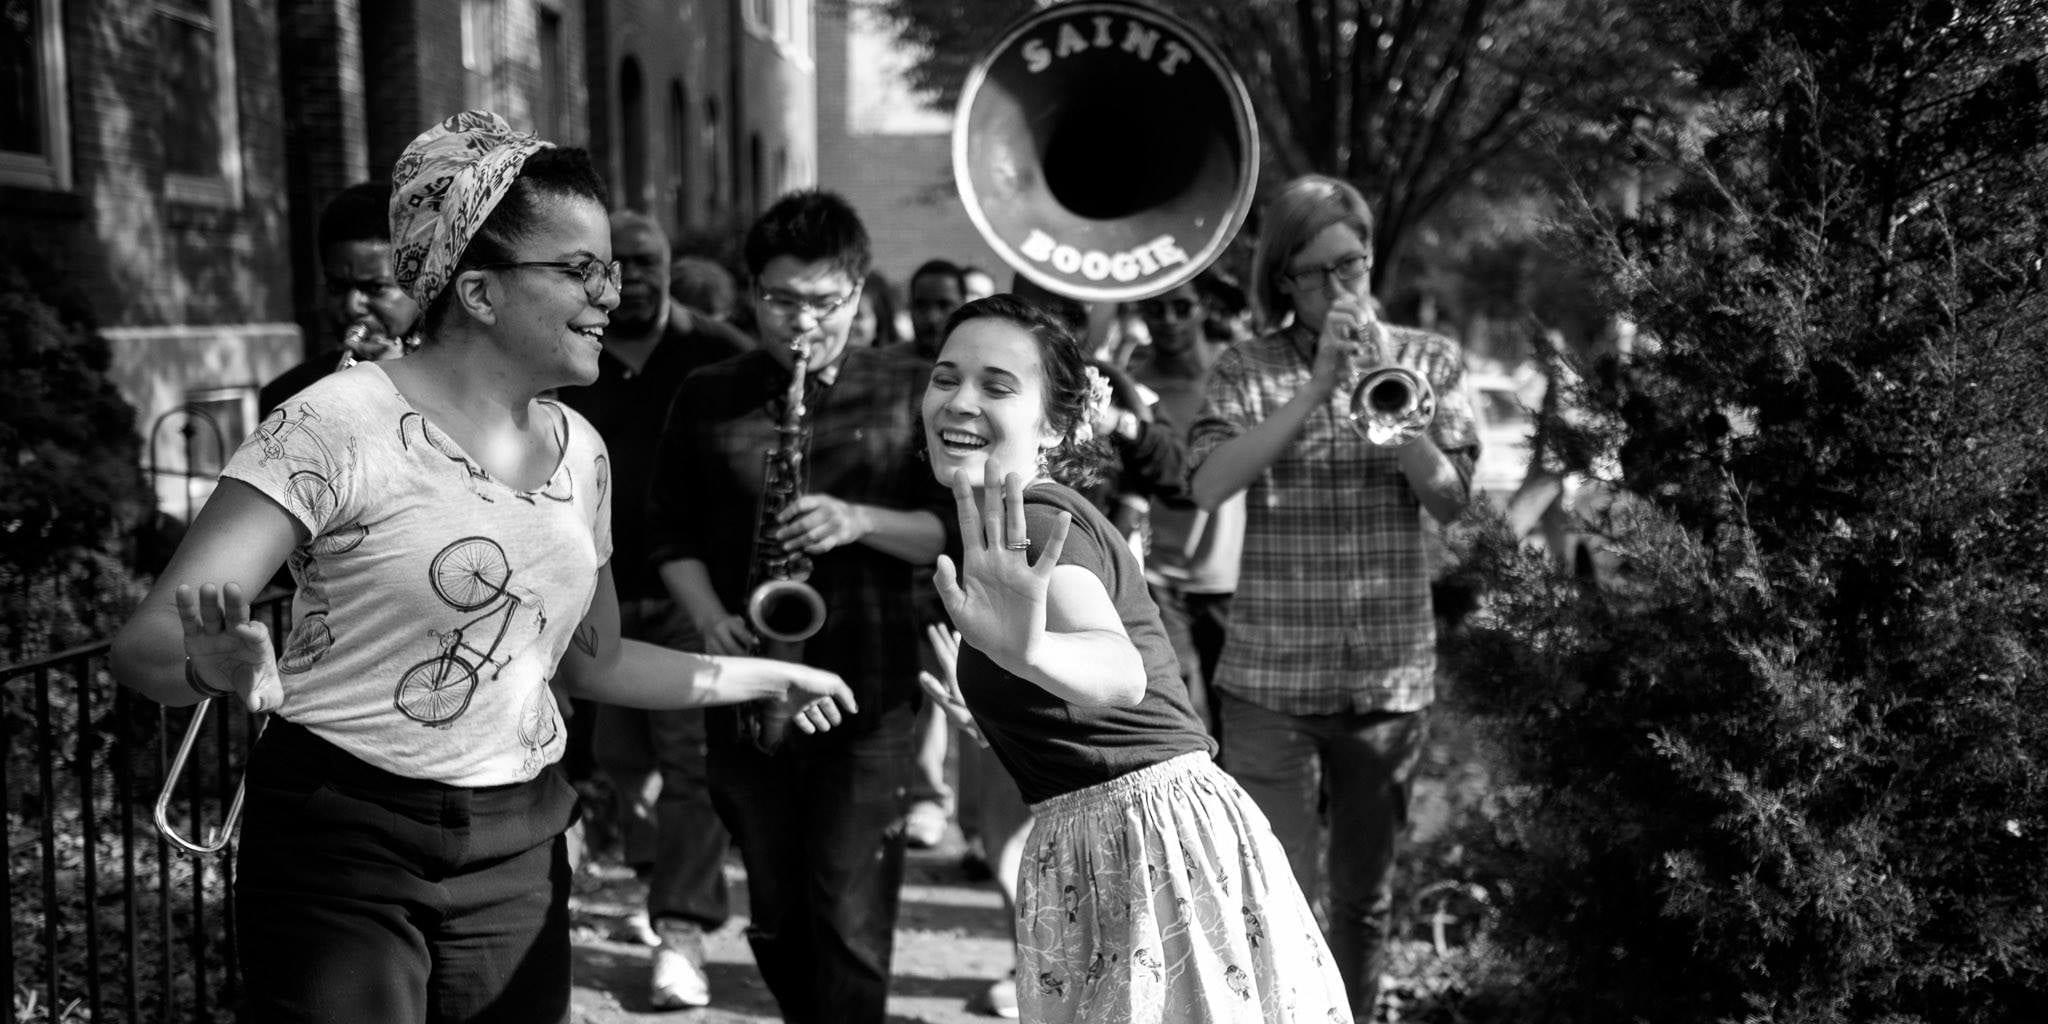 Music and dancing at the Cherokee Street Jazz Crawl.